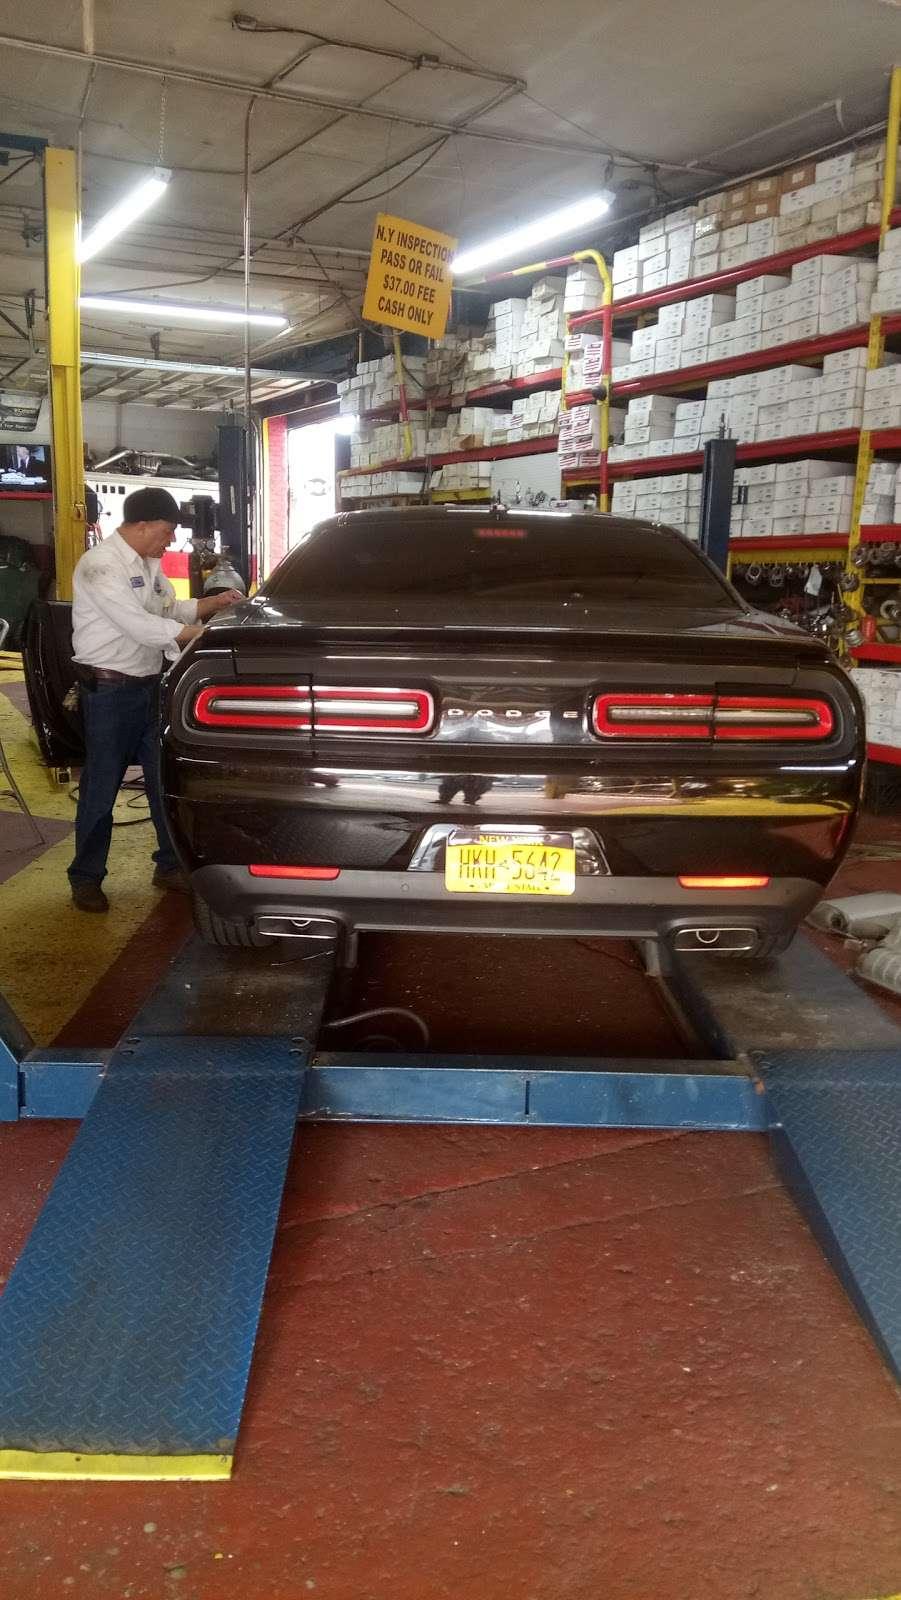 Bronx Discount Muffler Center - car repair  | Photo 9 of 10 | Address: 501 Bruckner Blvd, Bronx, NY 10455, USA | Phone: (718) 402-4422